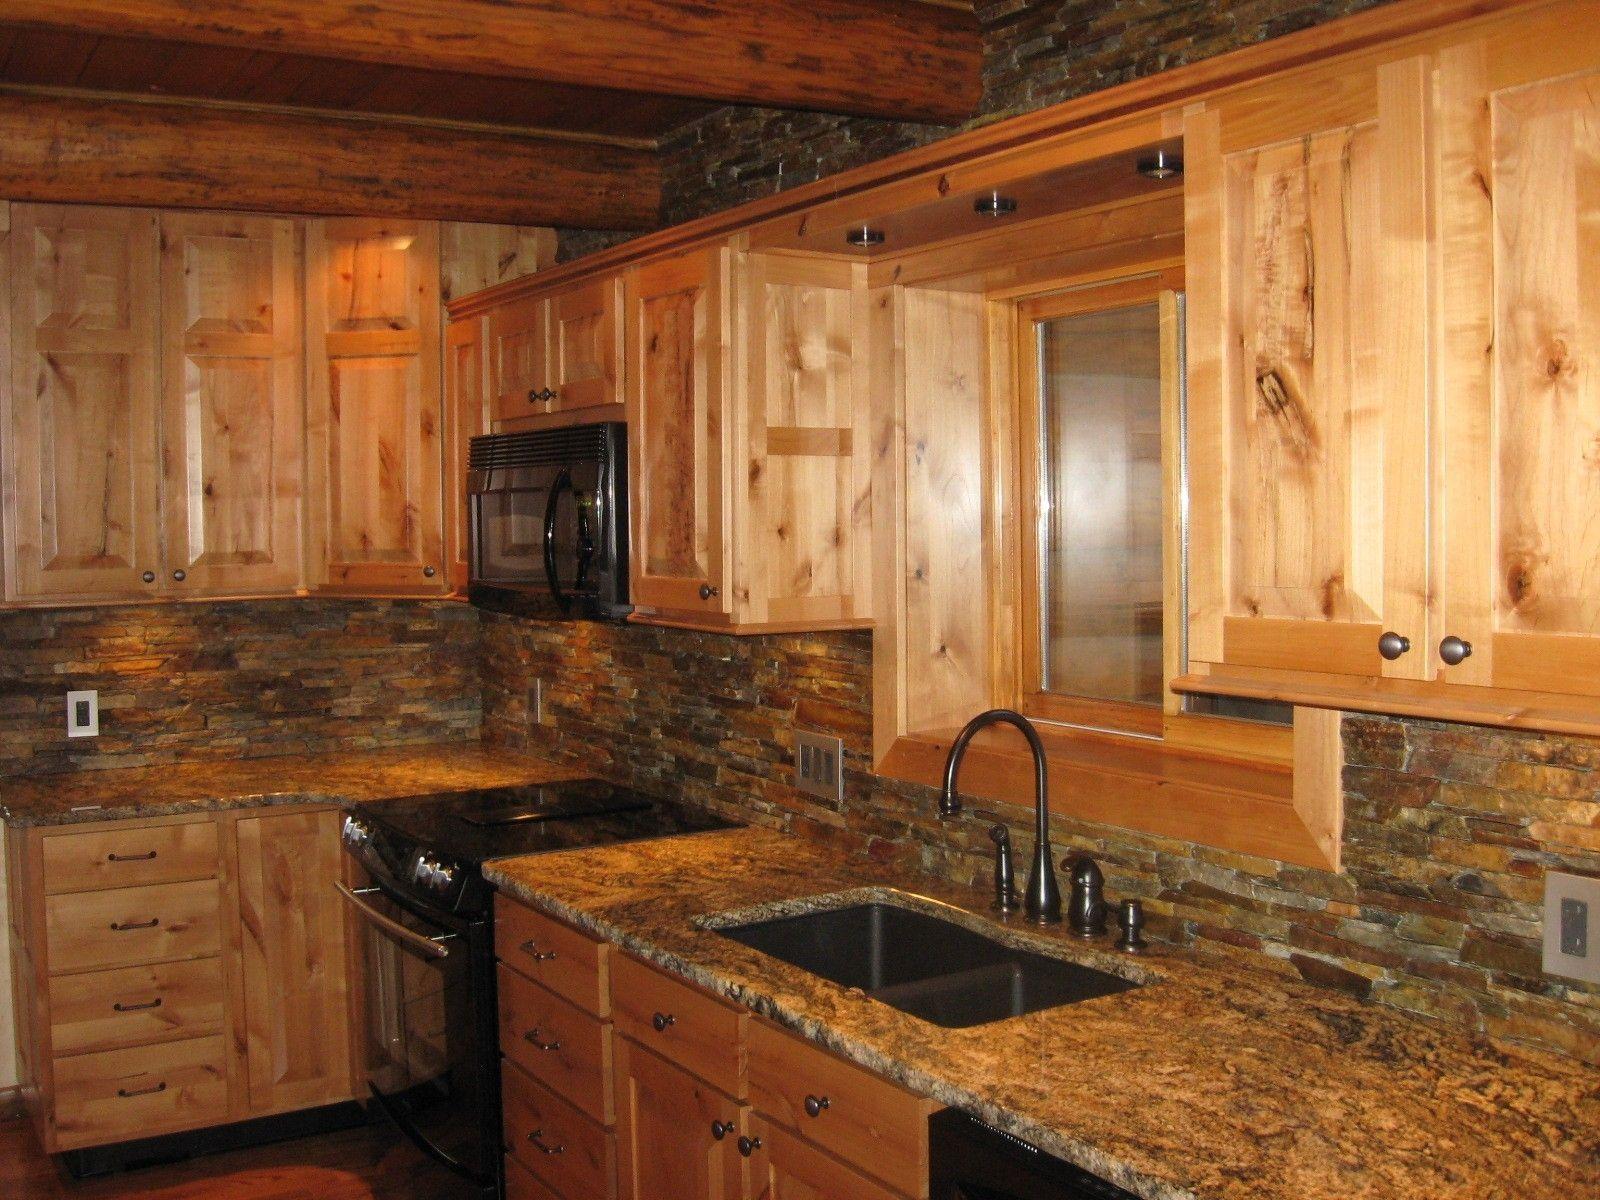 Knotty Alder Kitchen Cabinets Doors In 2020 Alder Kitchen Cabinets Knotty Alder Kitchen Rustic Kitchen Cabinets